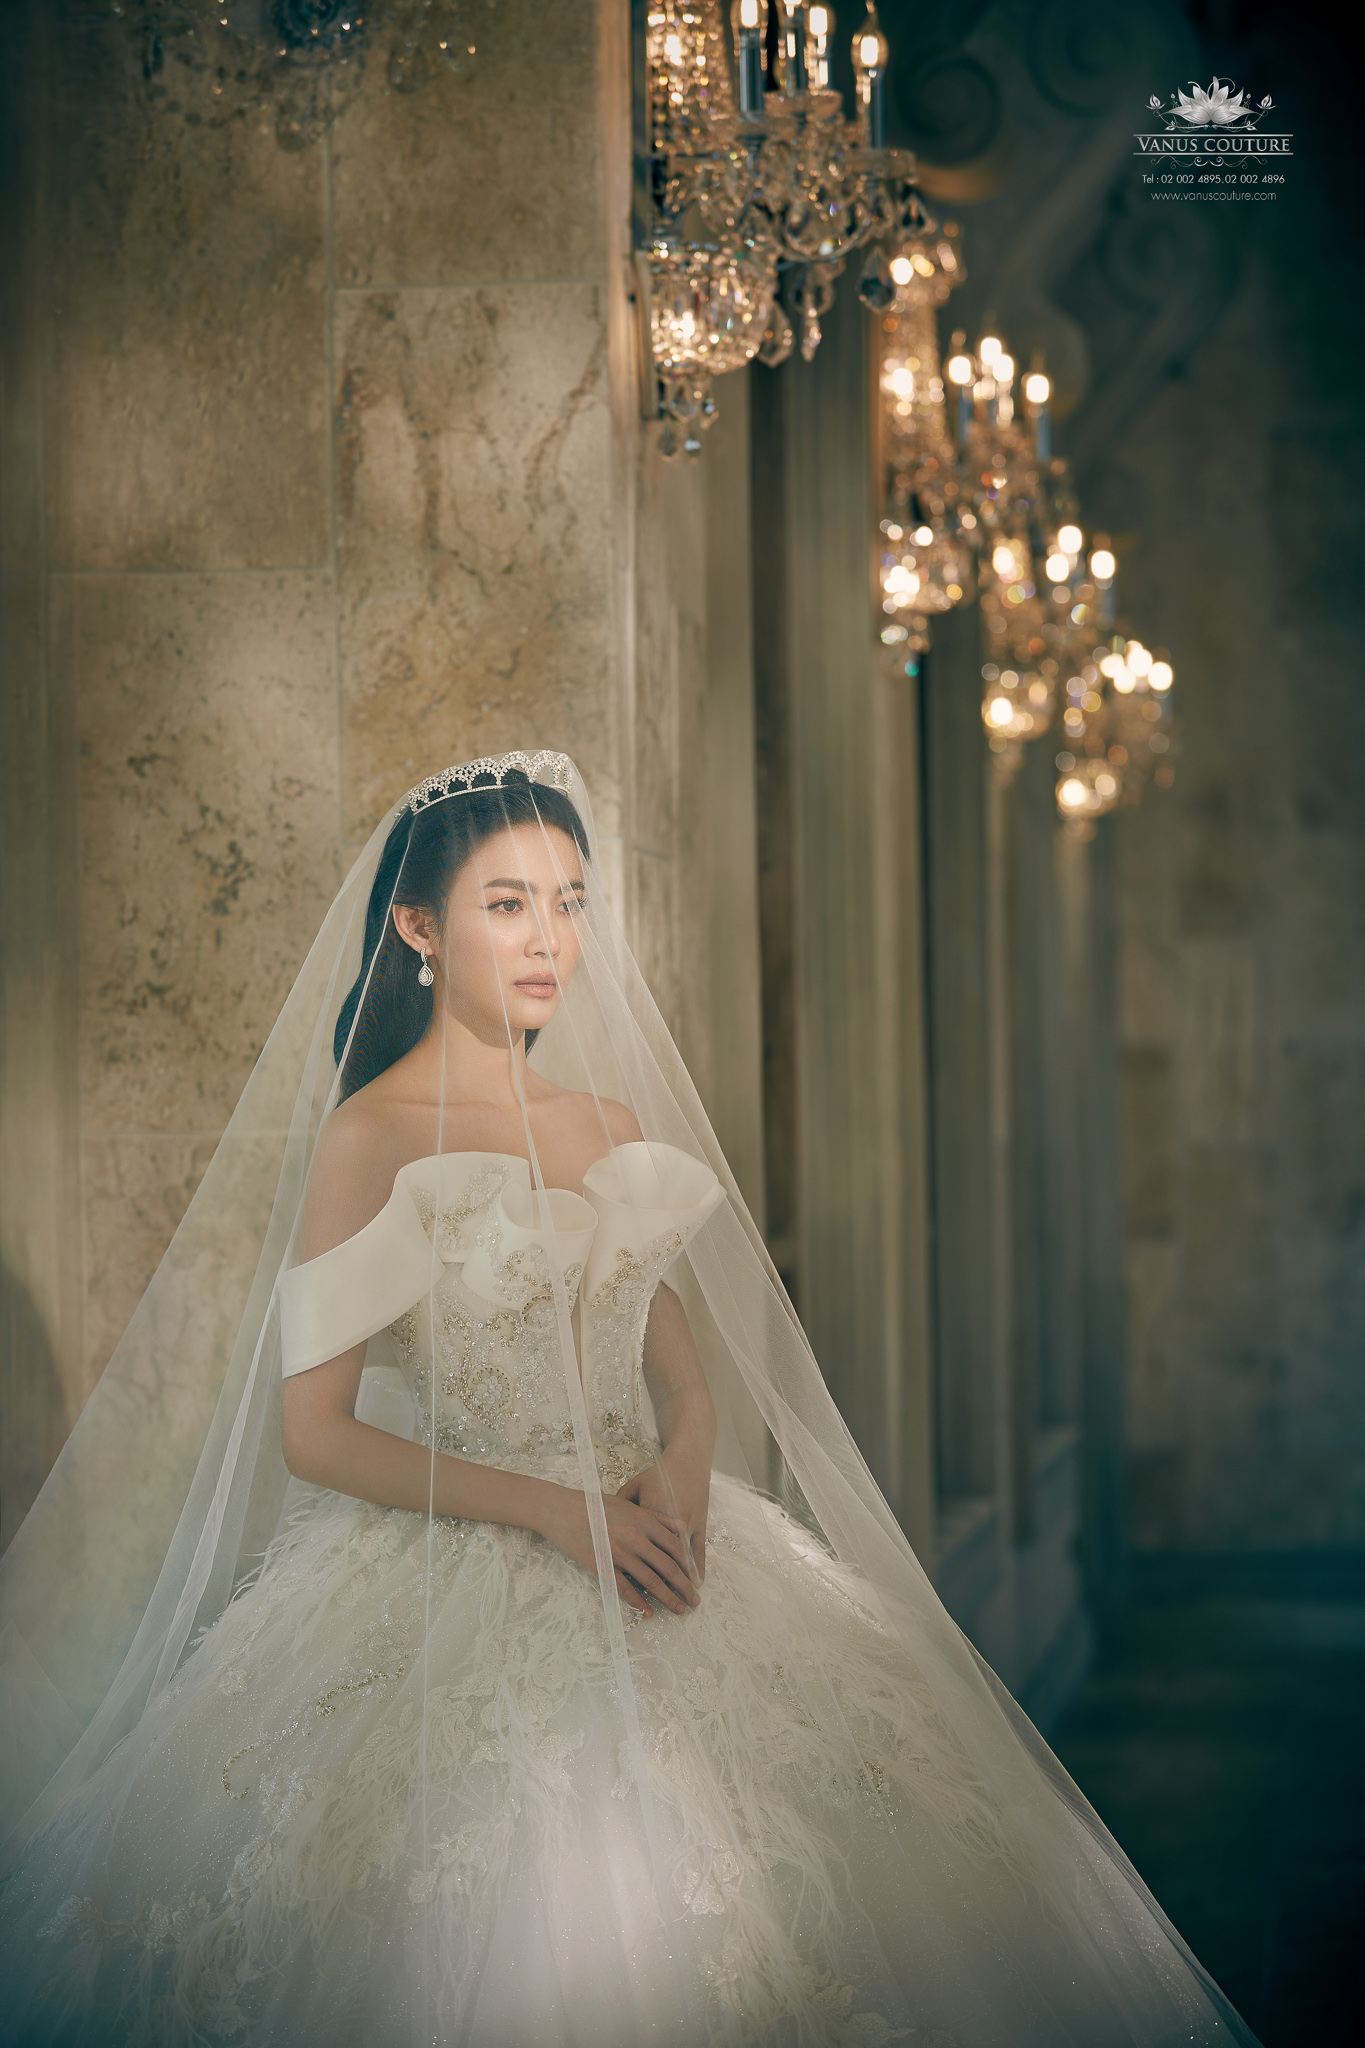 Superball wedding dress - Gybzy 03